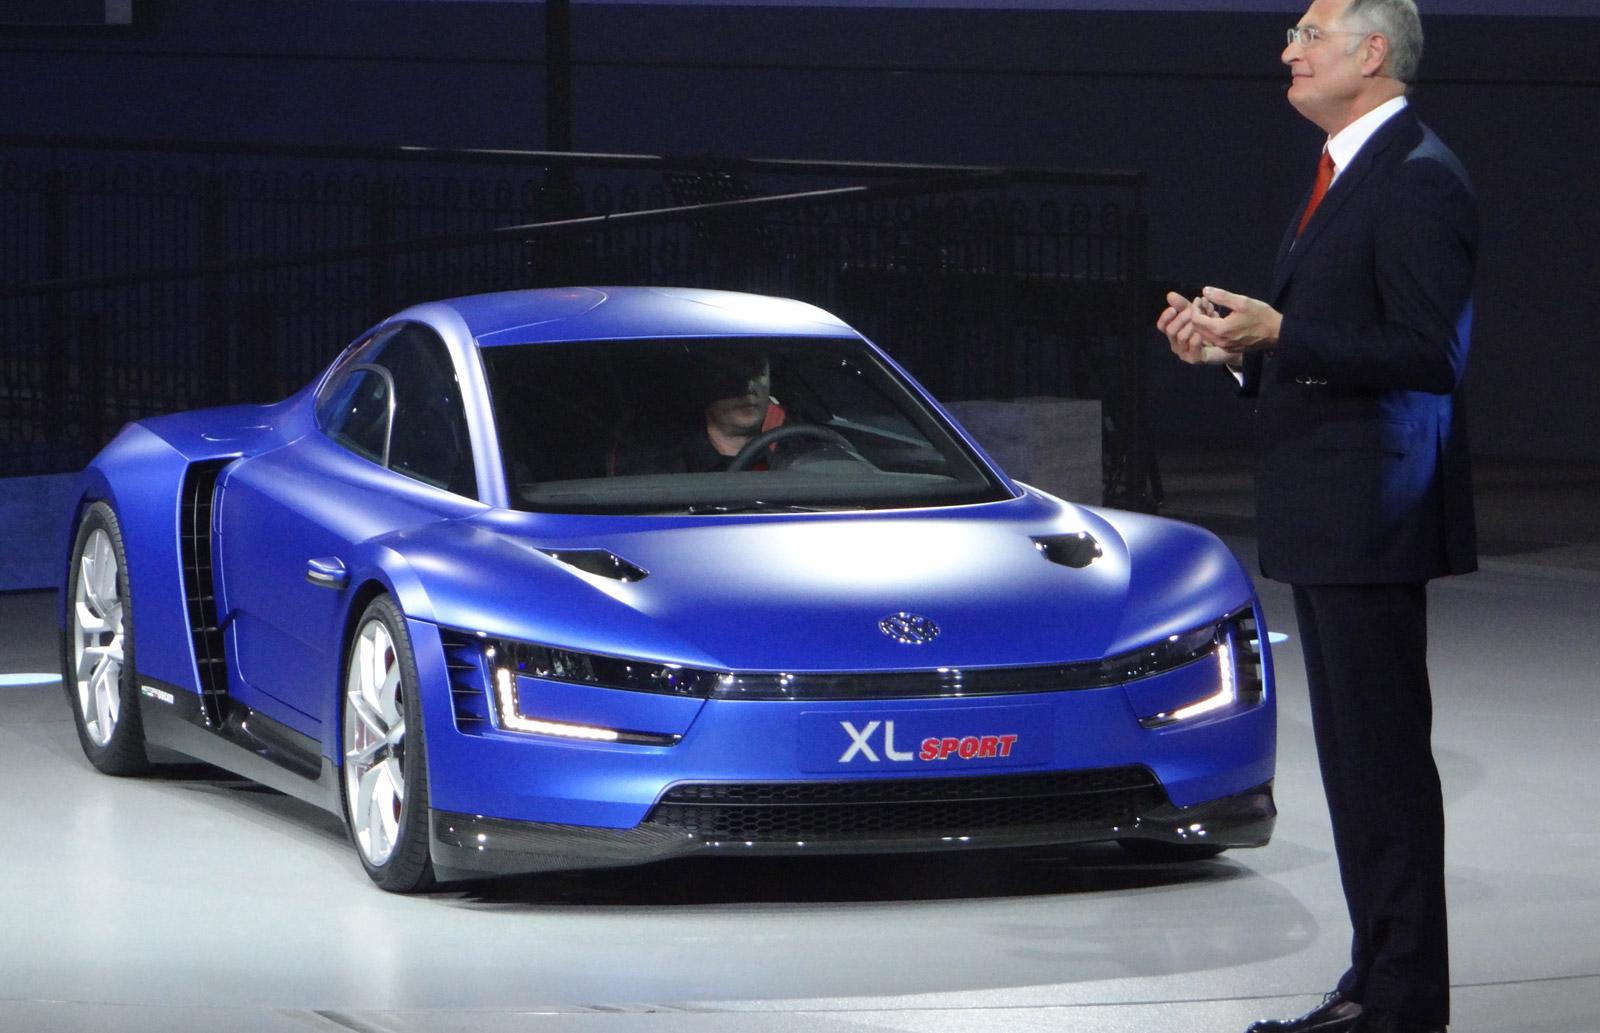 Volkswagen XL Sport At Paris Motor Show: The Details (Video)